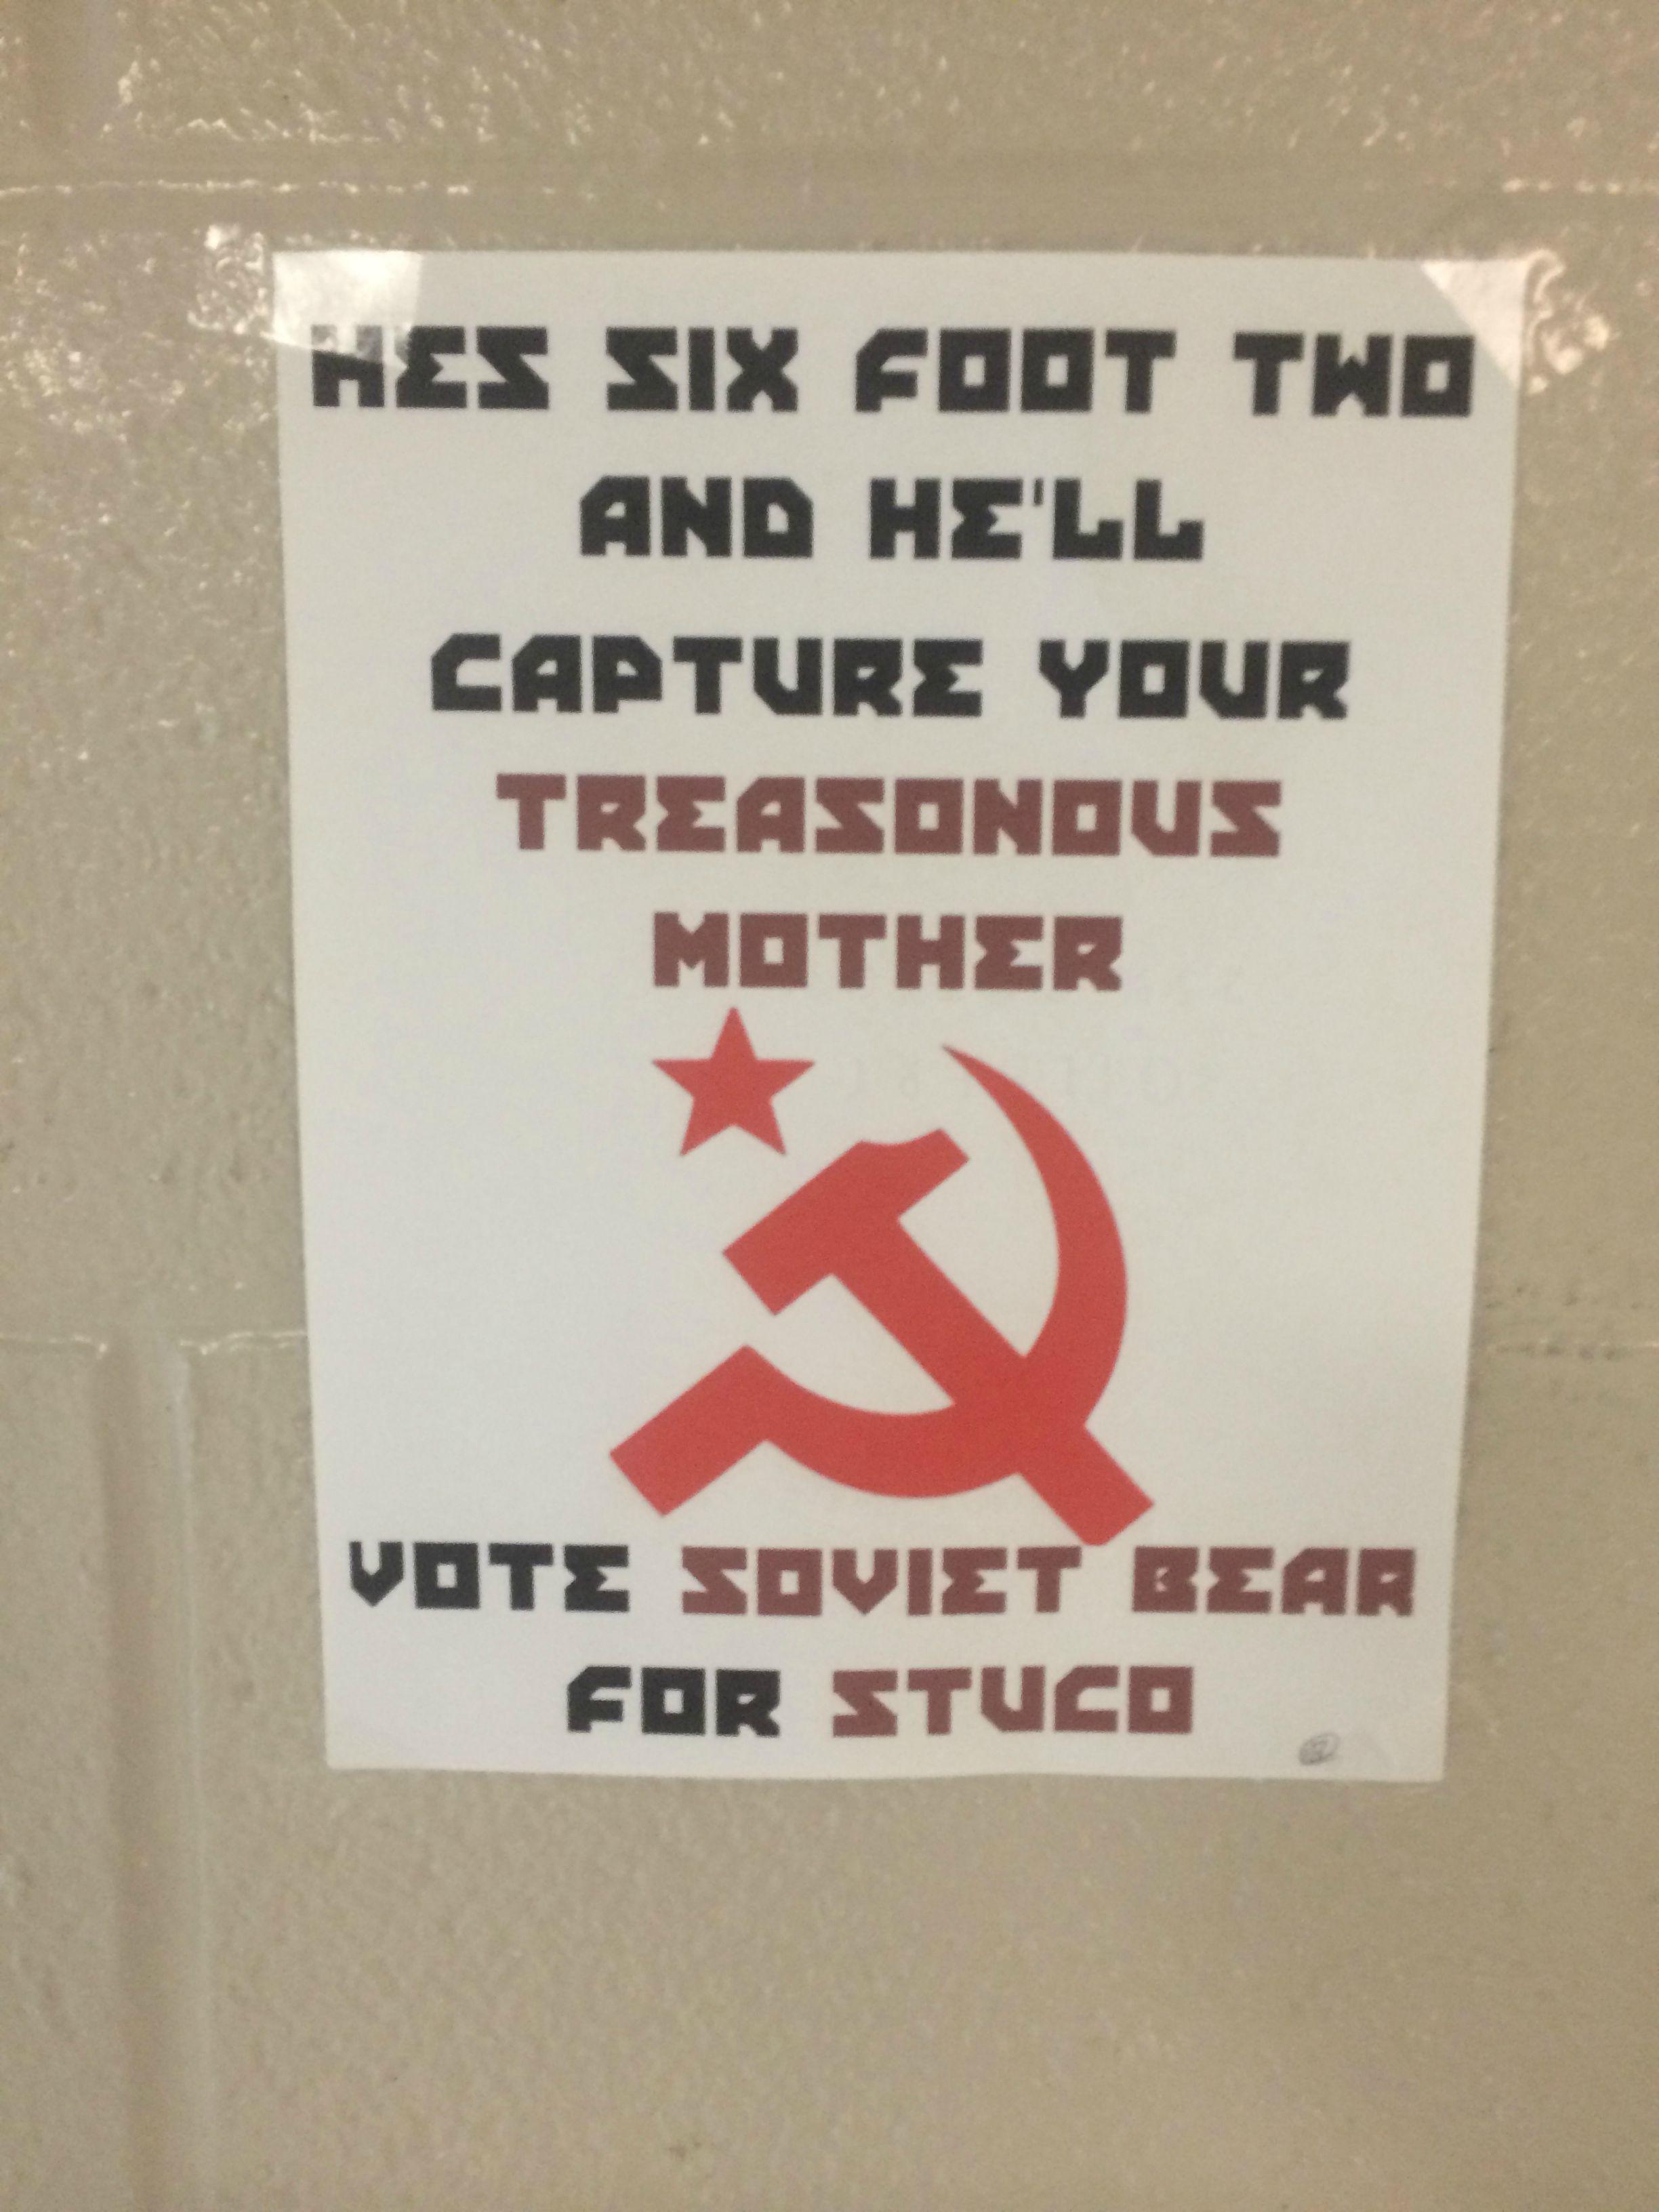 [Image - 751175] | Soviet Bear | Know Your Meme